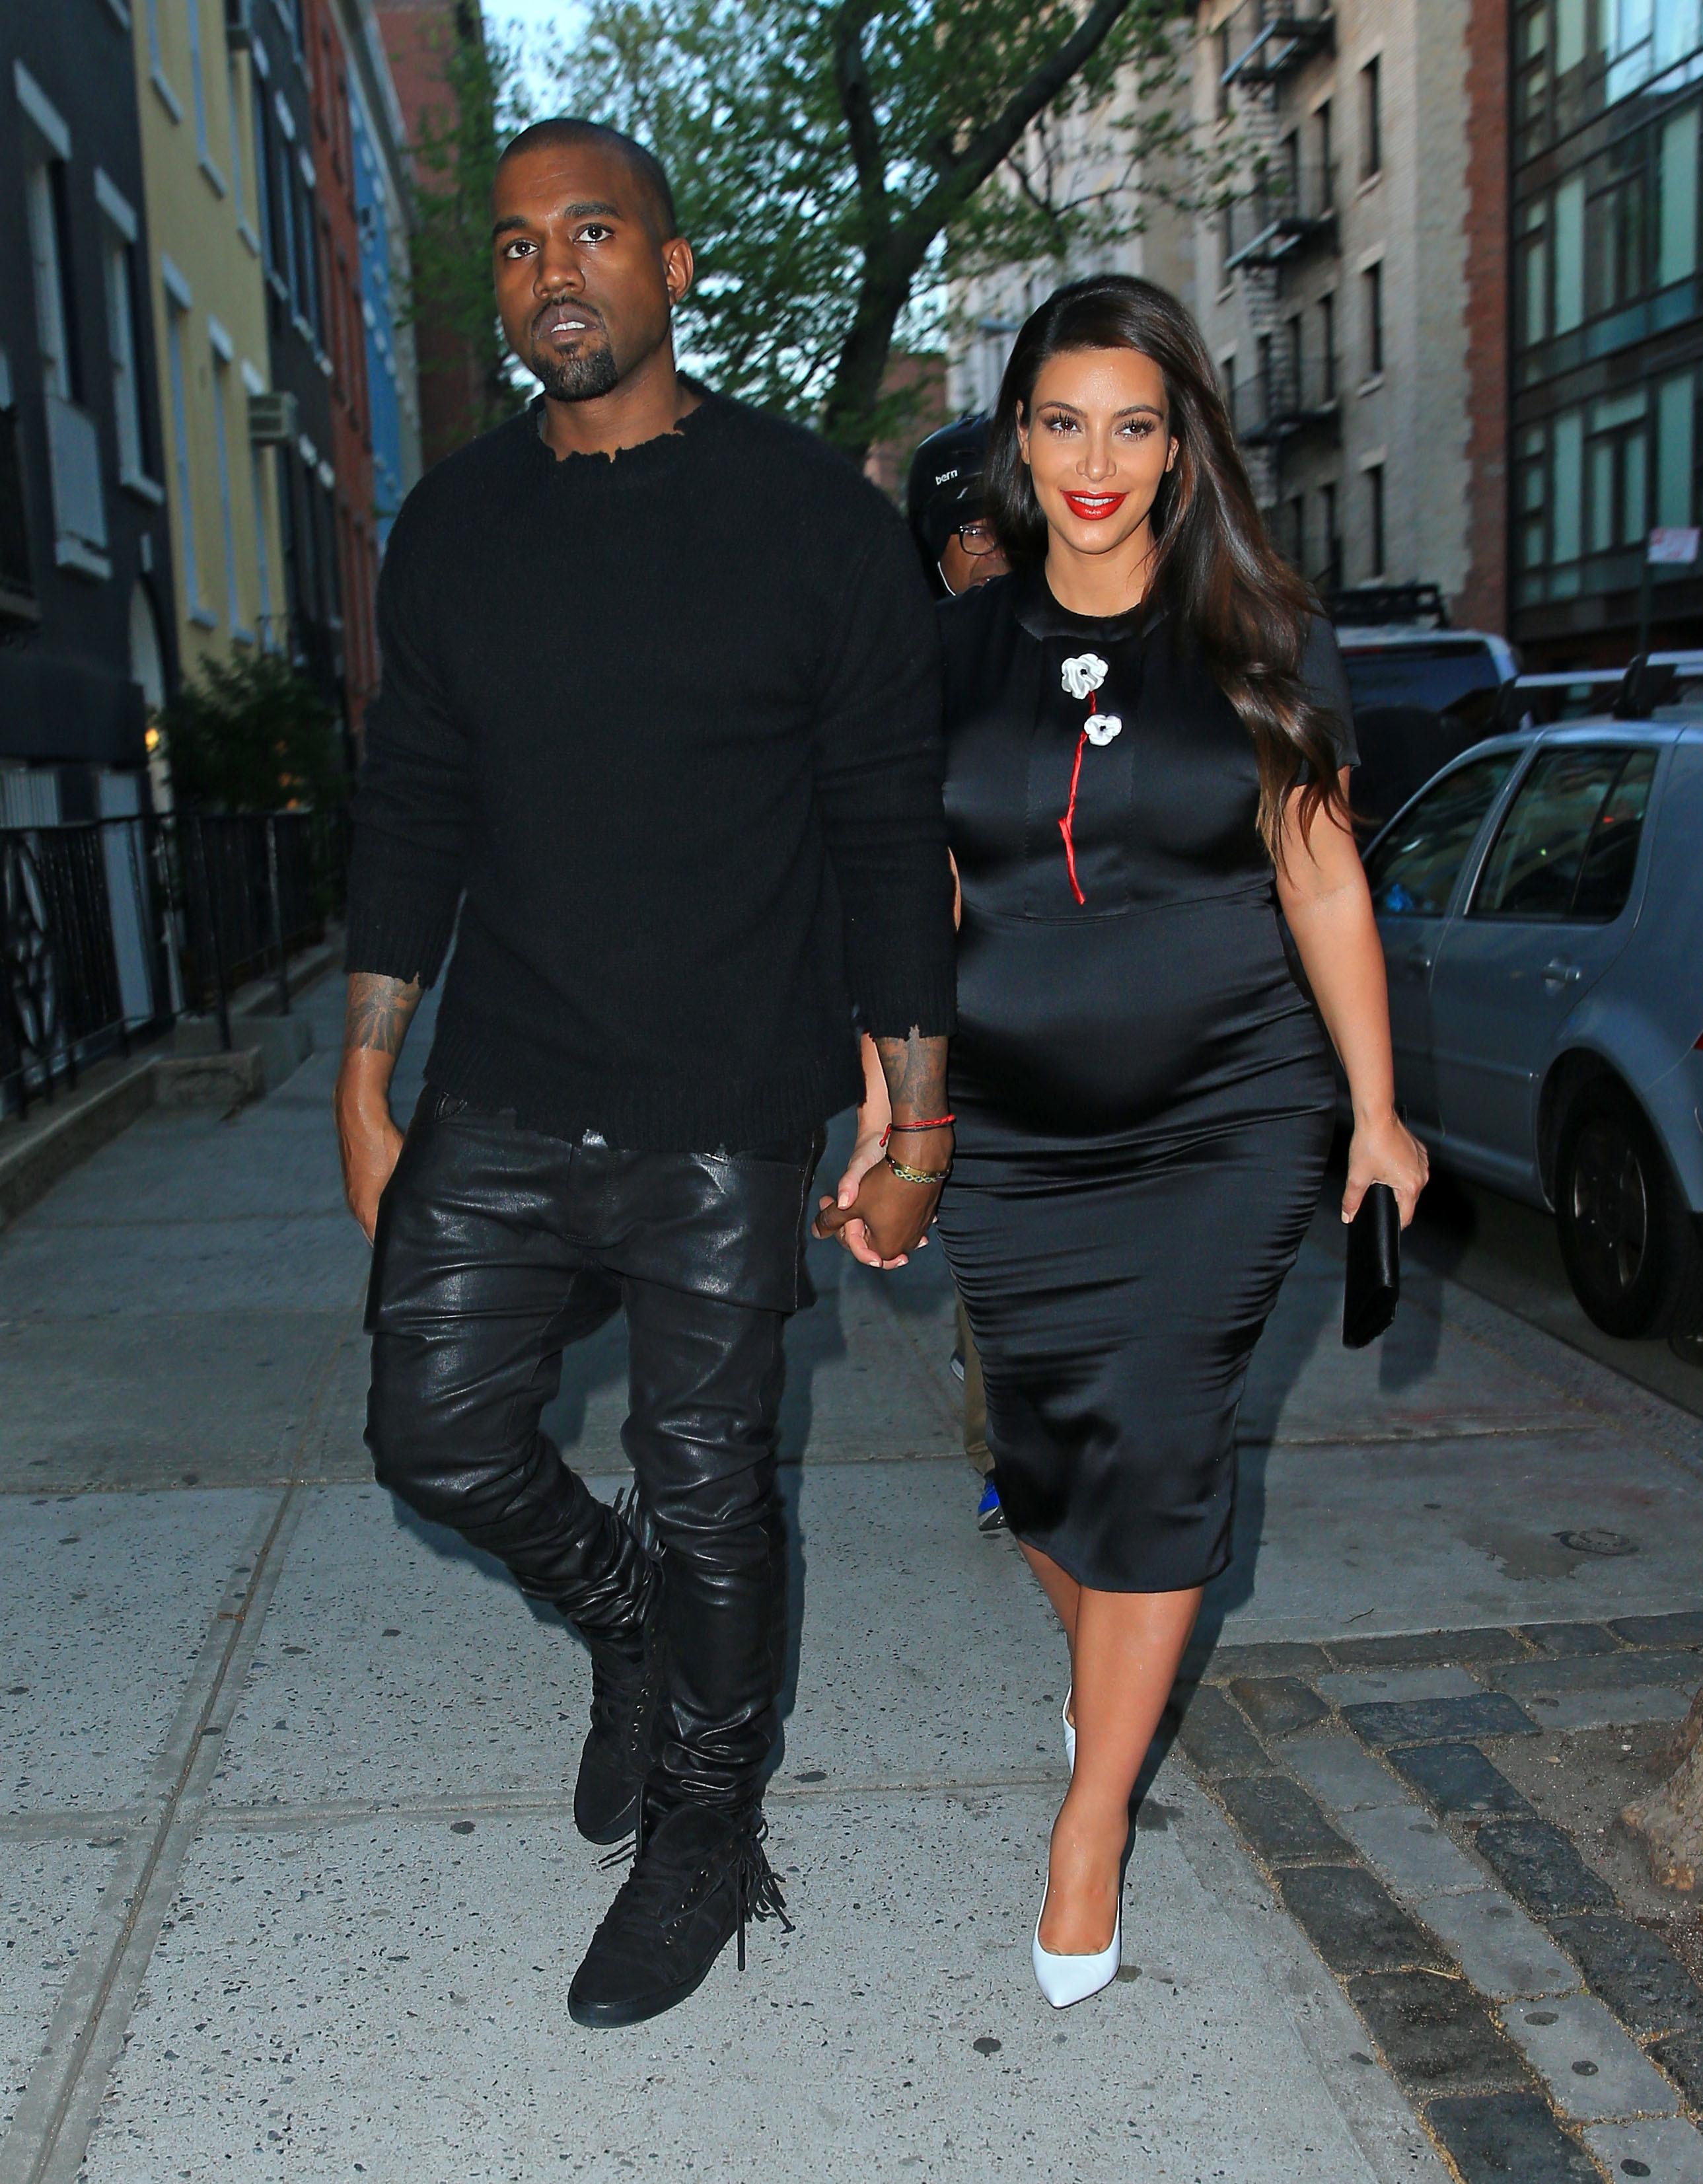 Kim Kardashian kanye west holding hands